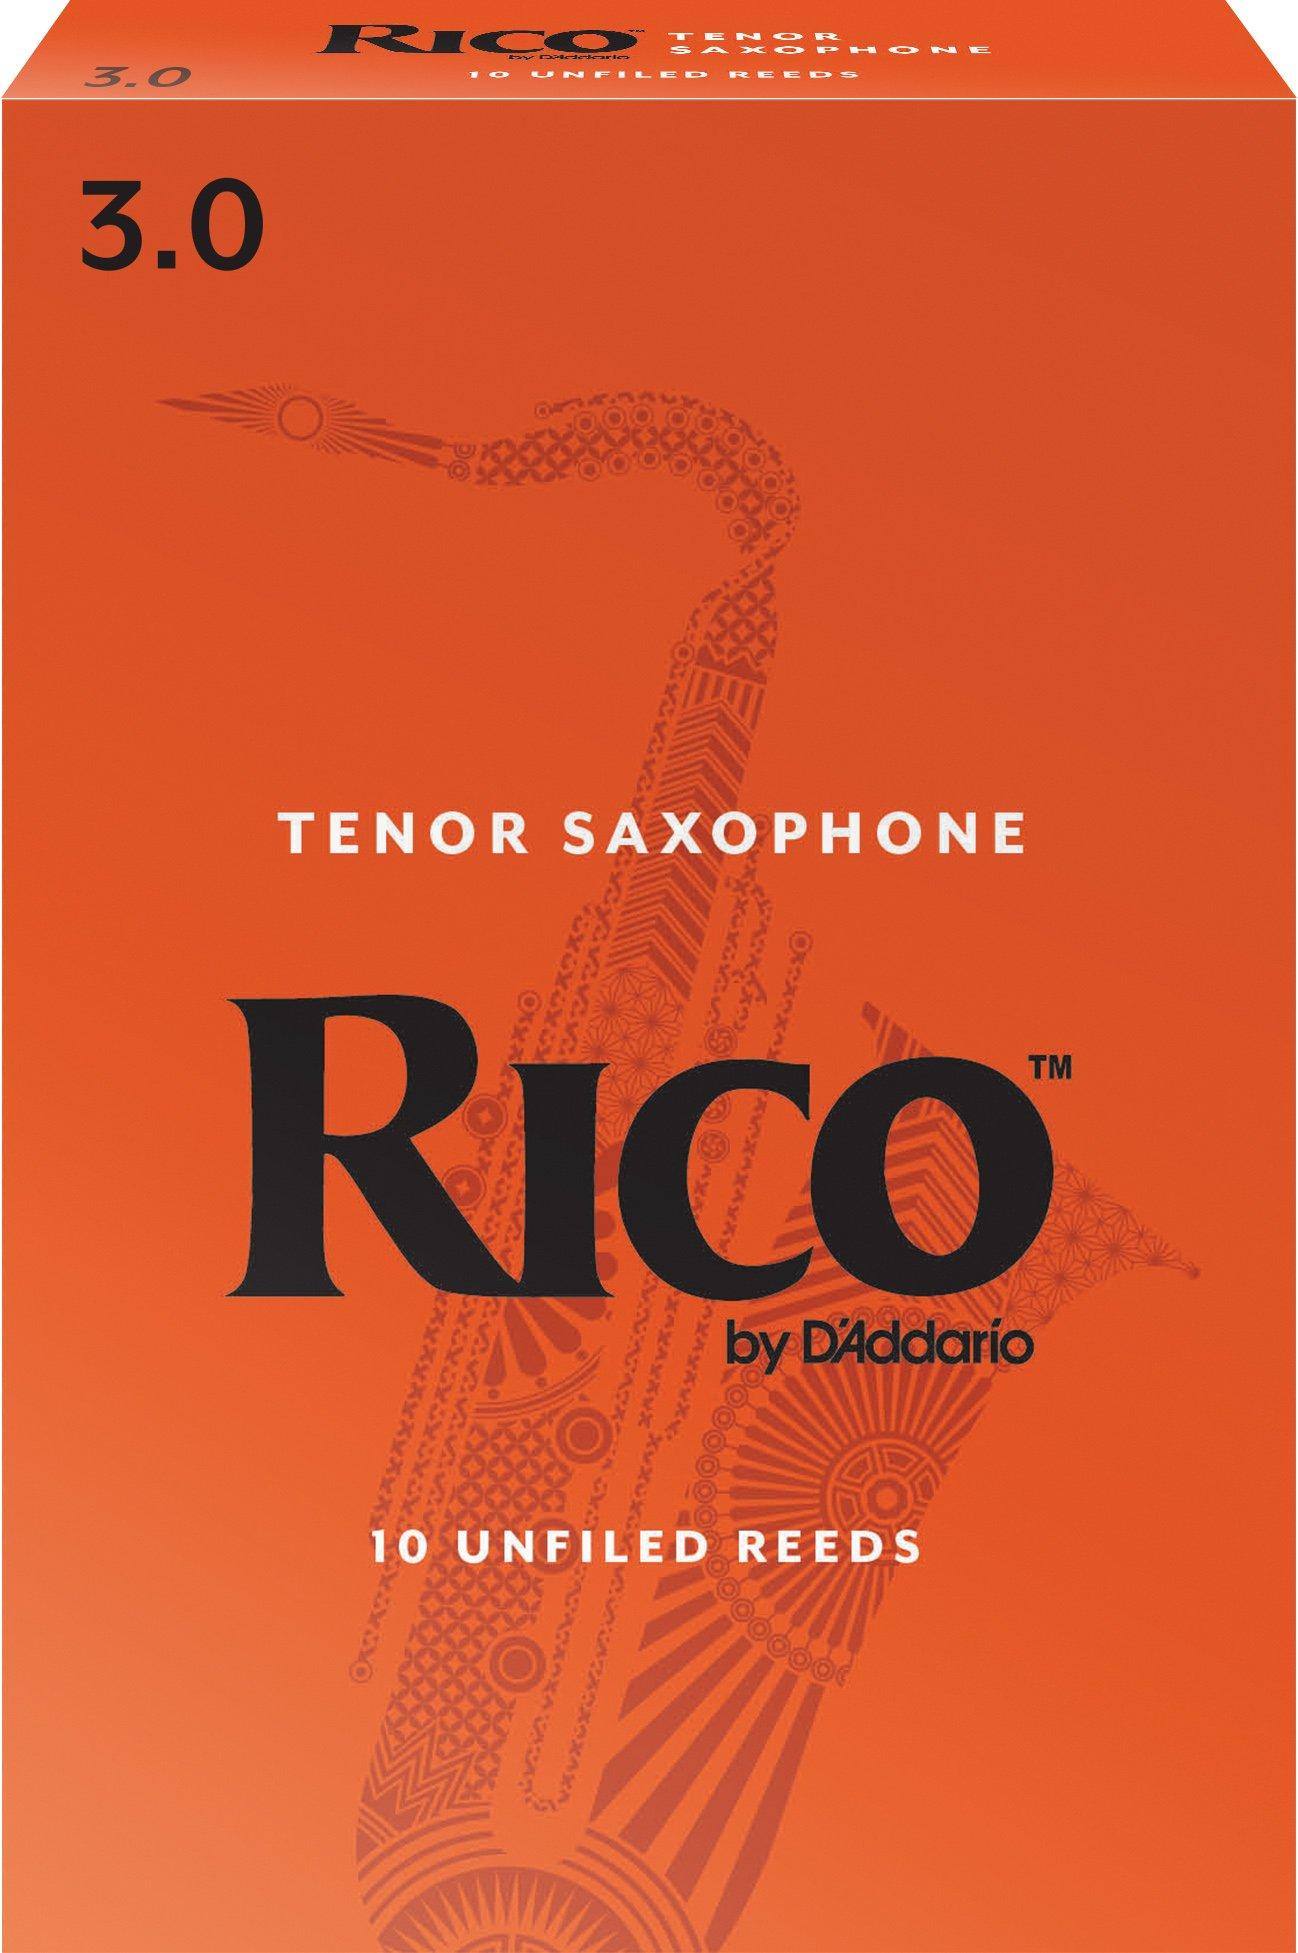 Rico by D'Addario RKA1030 Tenor Sax Reeds, Strength 3.0, 10-pack